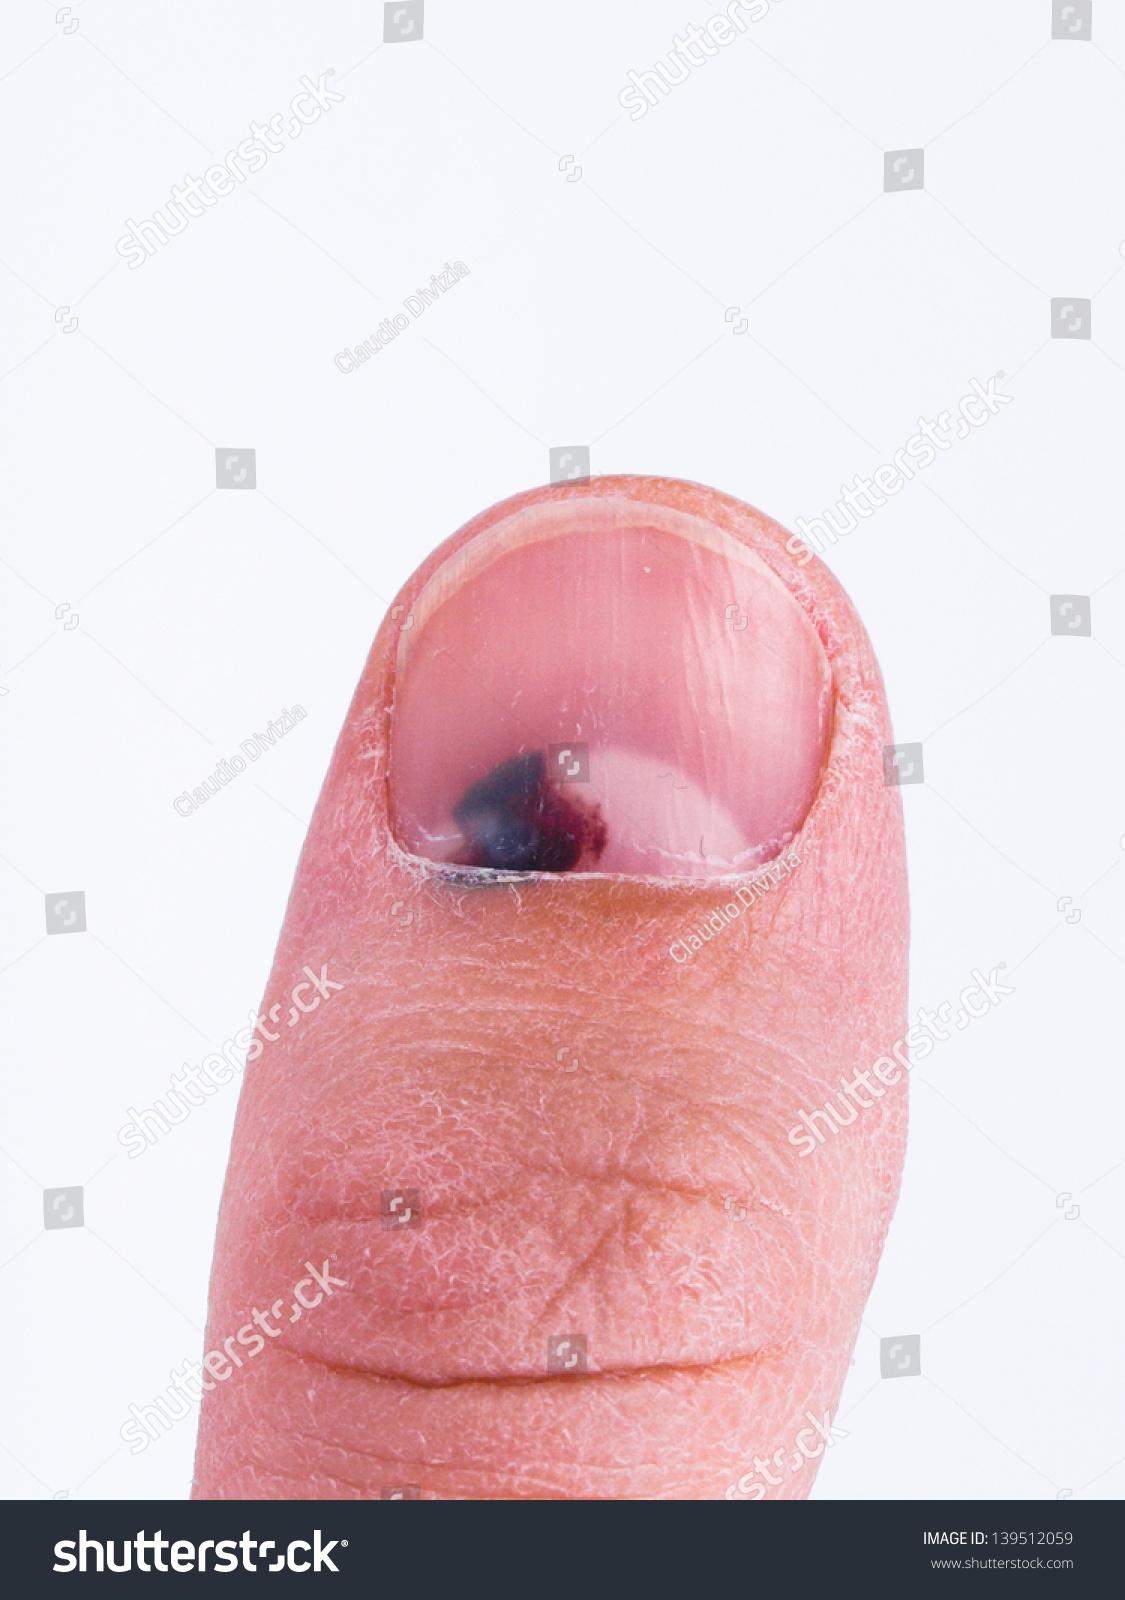 toenail condition